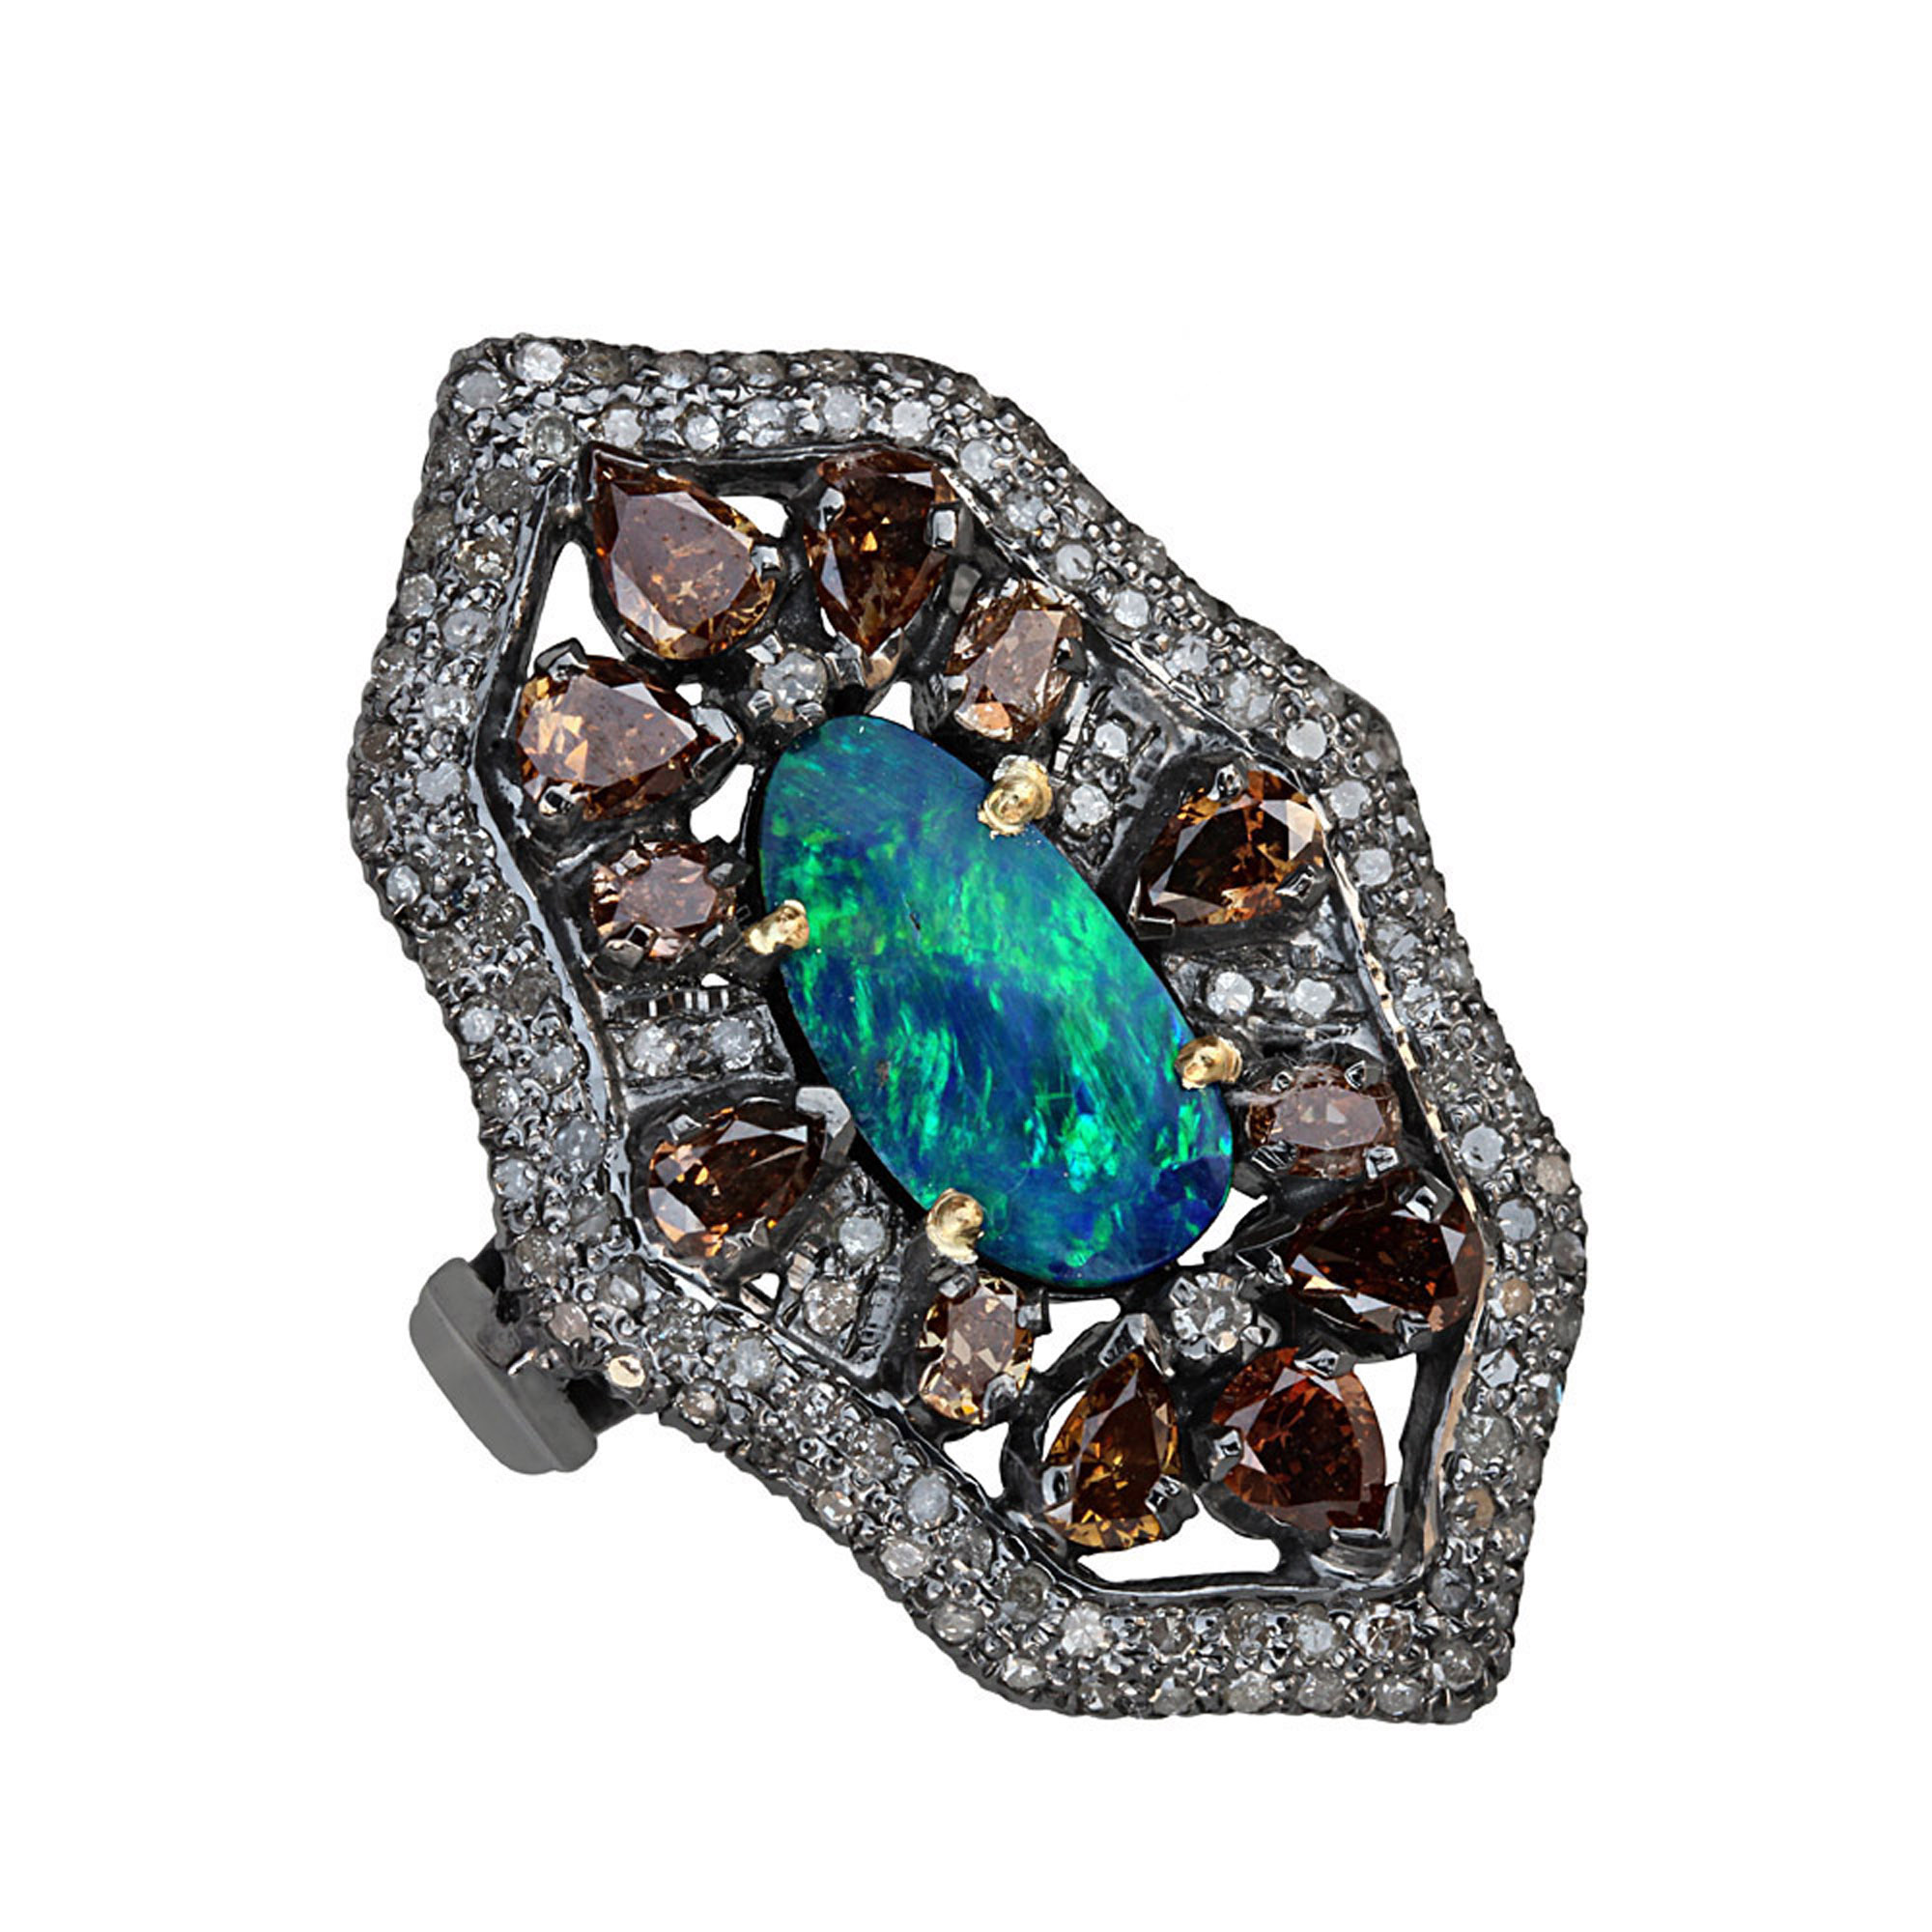 Natural diamond pave & opal gold & silver designer ring